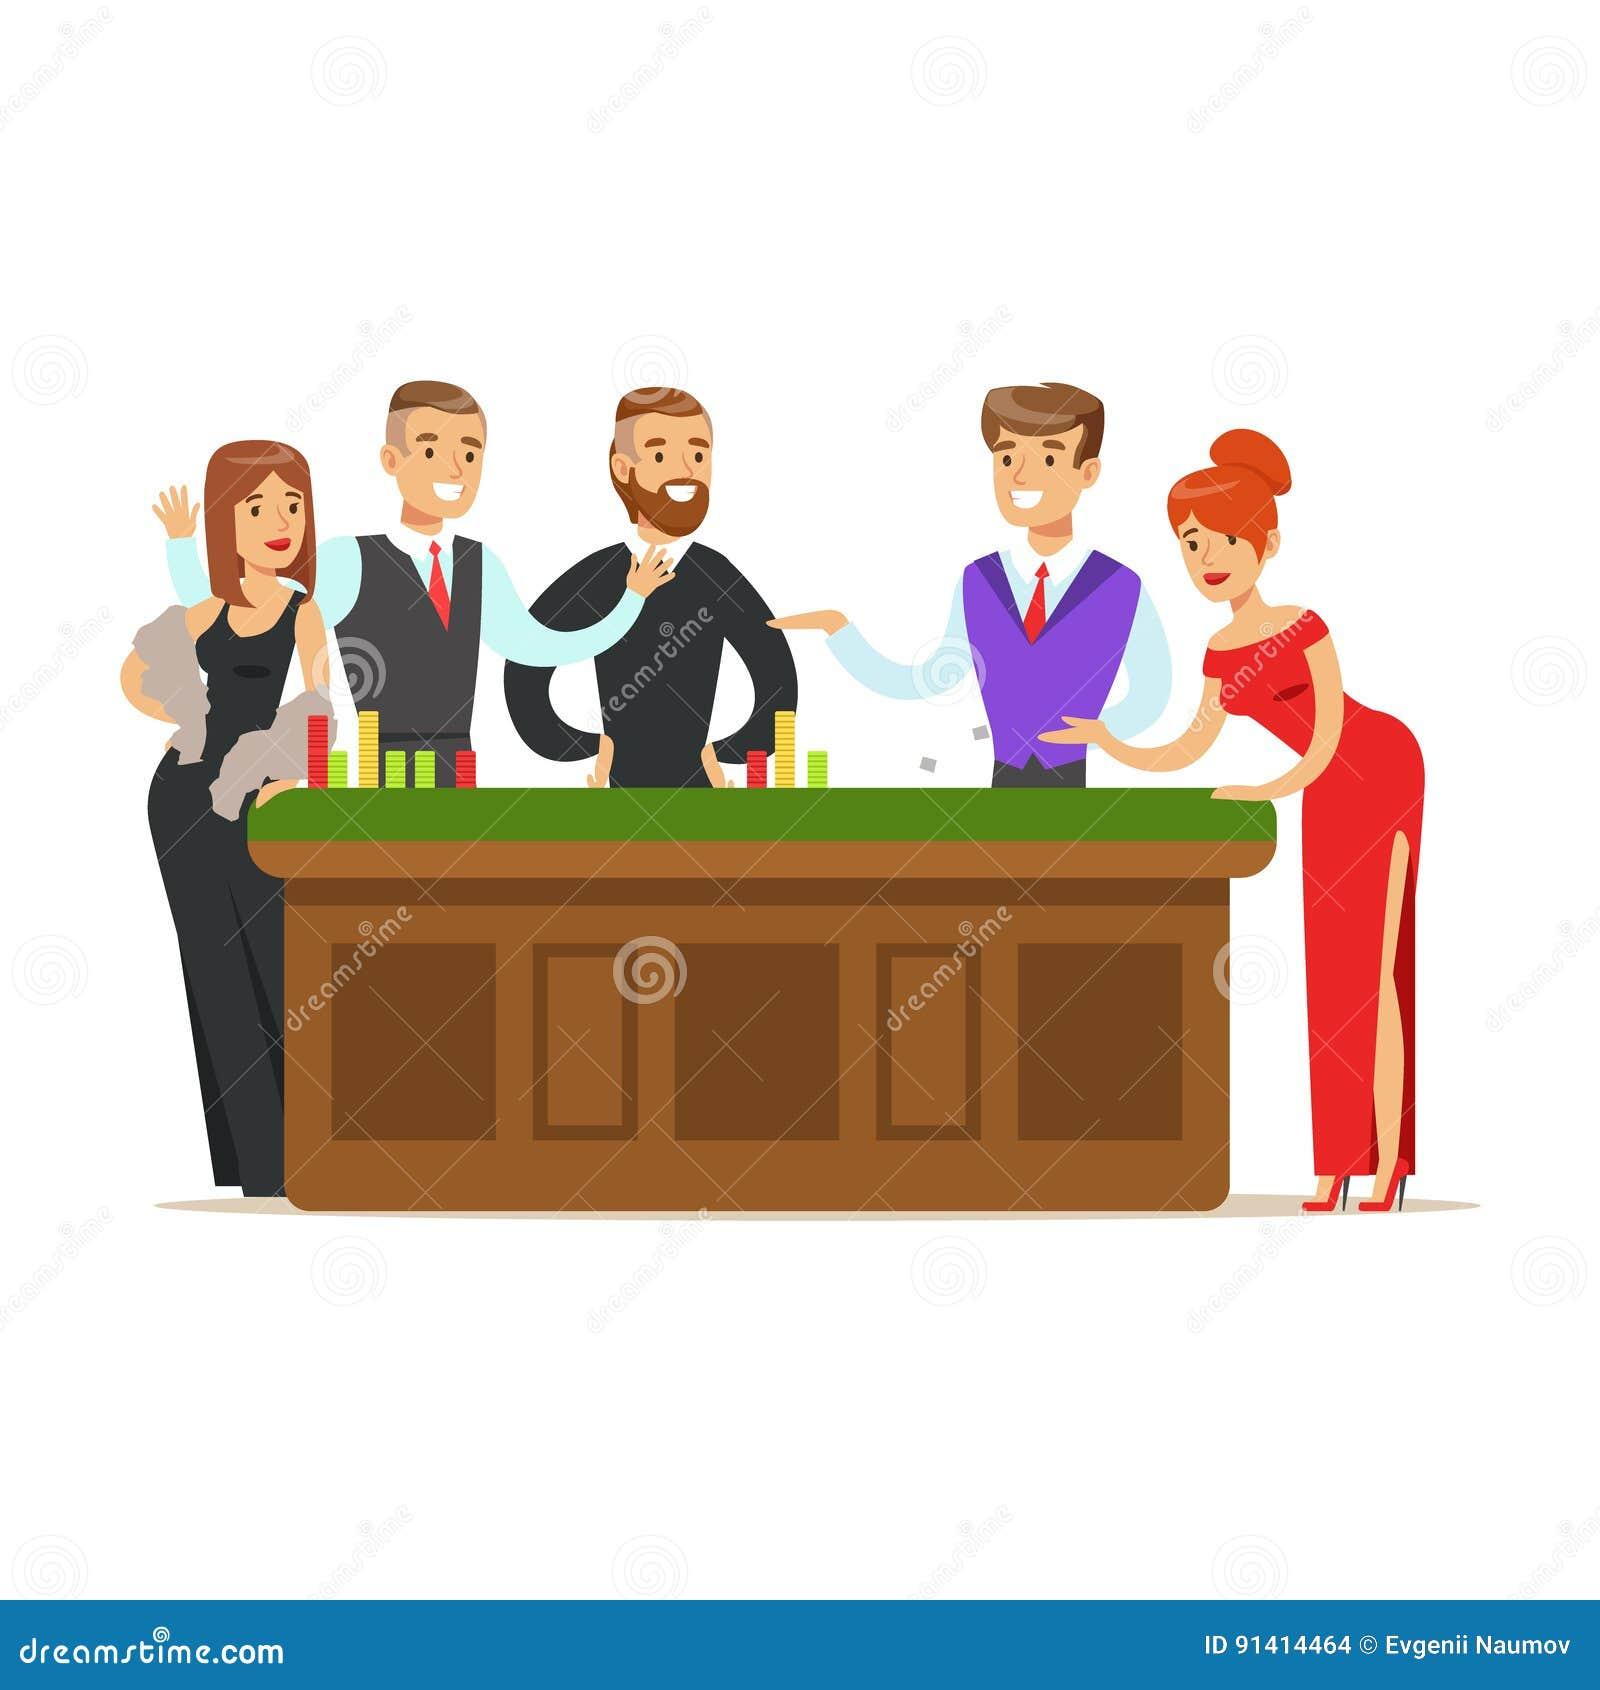 Business team cartoon characters cartoon vector cartoondealer com - Royalty Free Vector Download Happy People Gambling At Table In Casino Colorful Cartoon Character